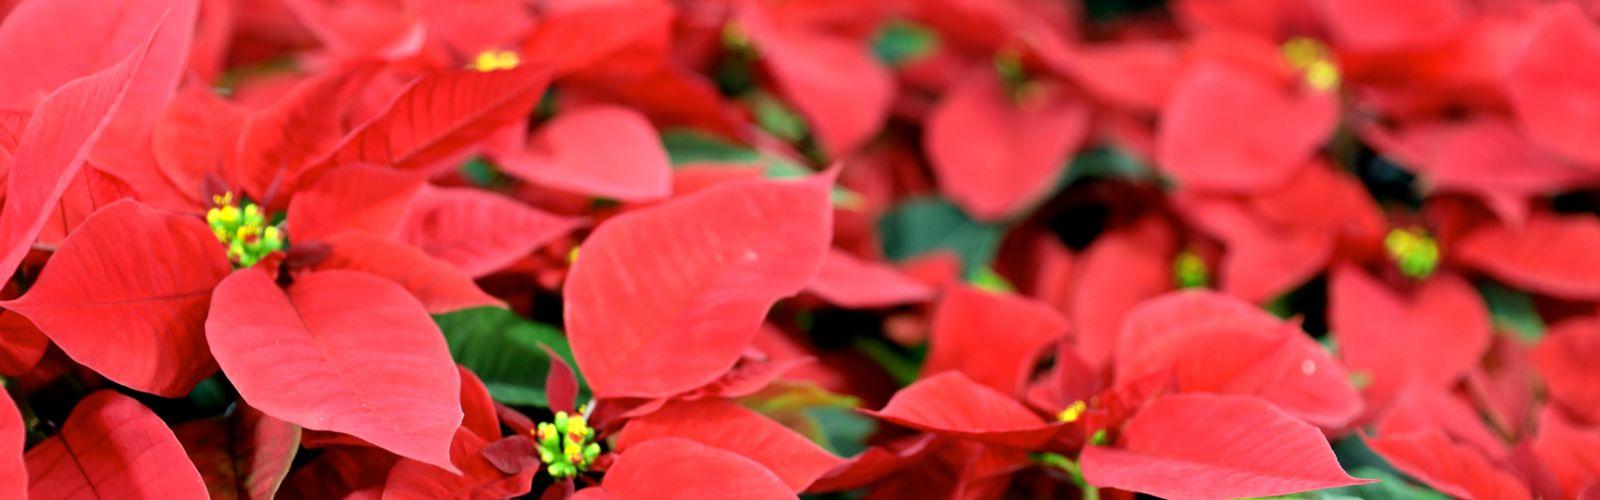 red poinsettias in bloom